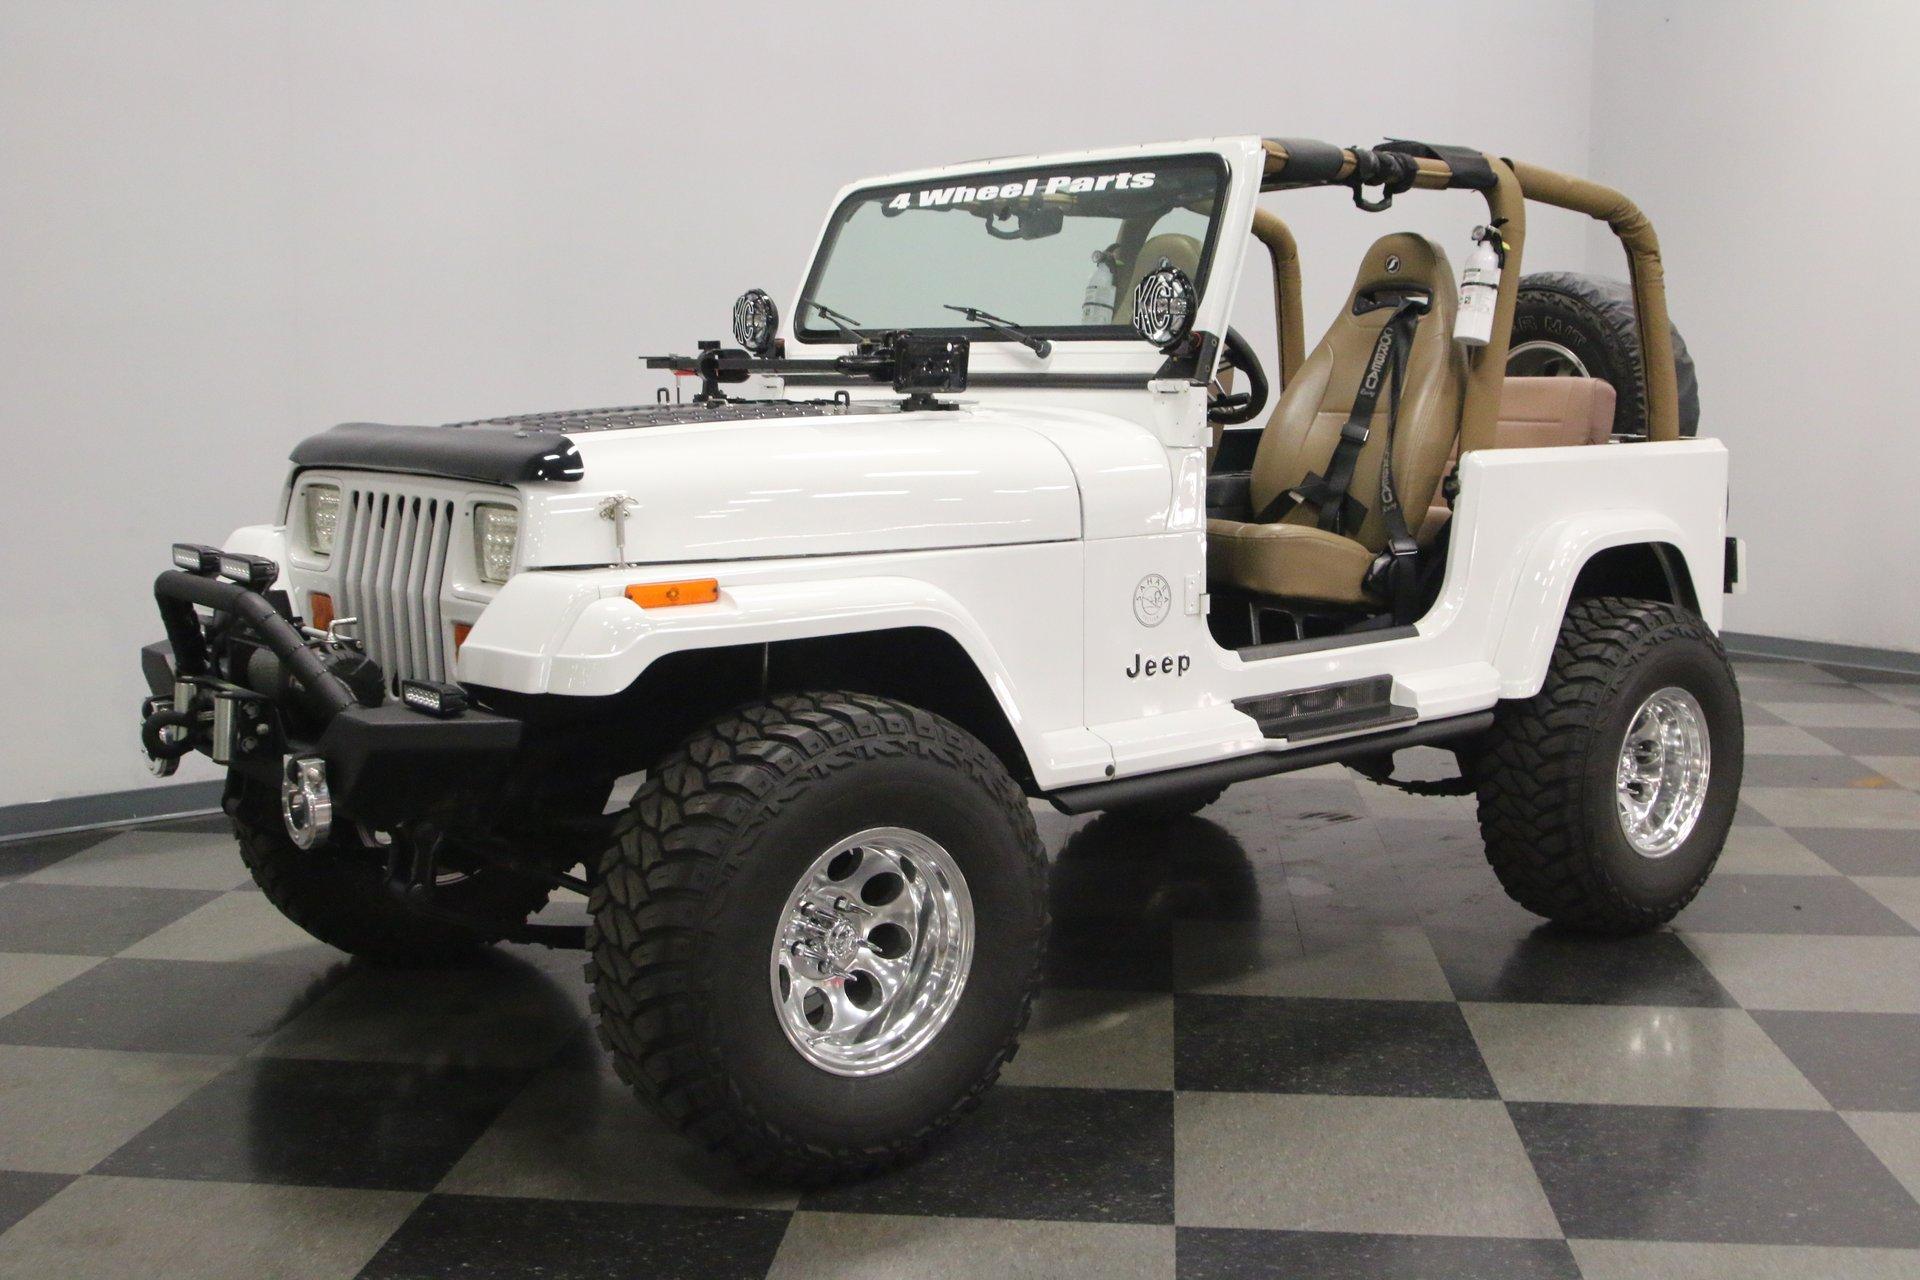 09e923df 1994 Jeep Wrangler | Streetside Classics - The Nation's Trusted ...